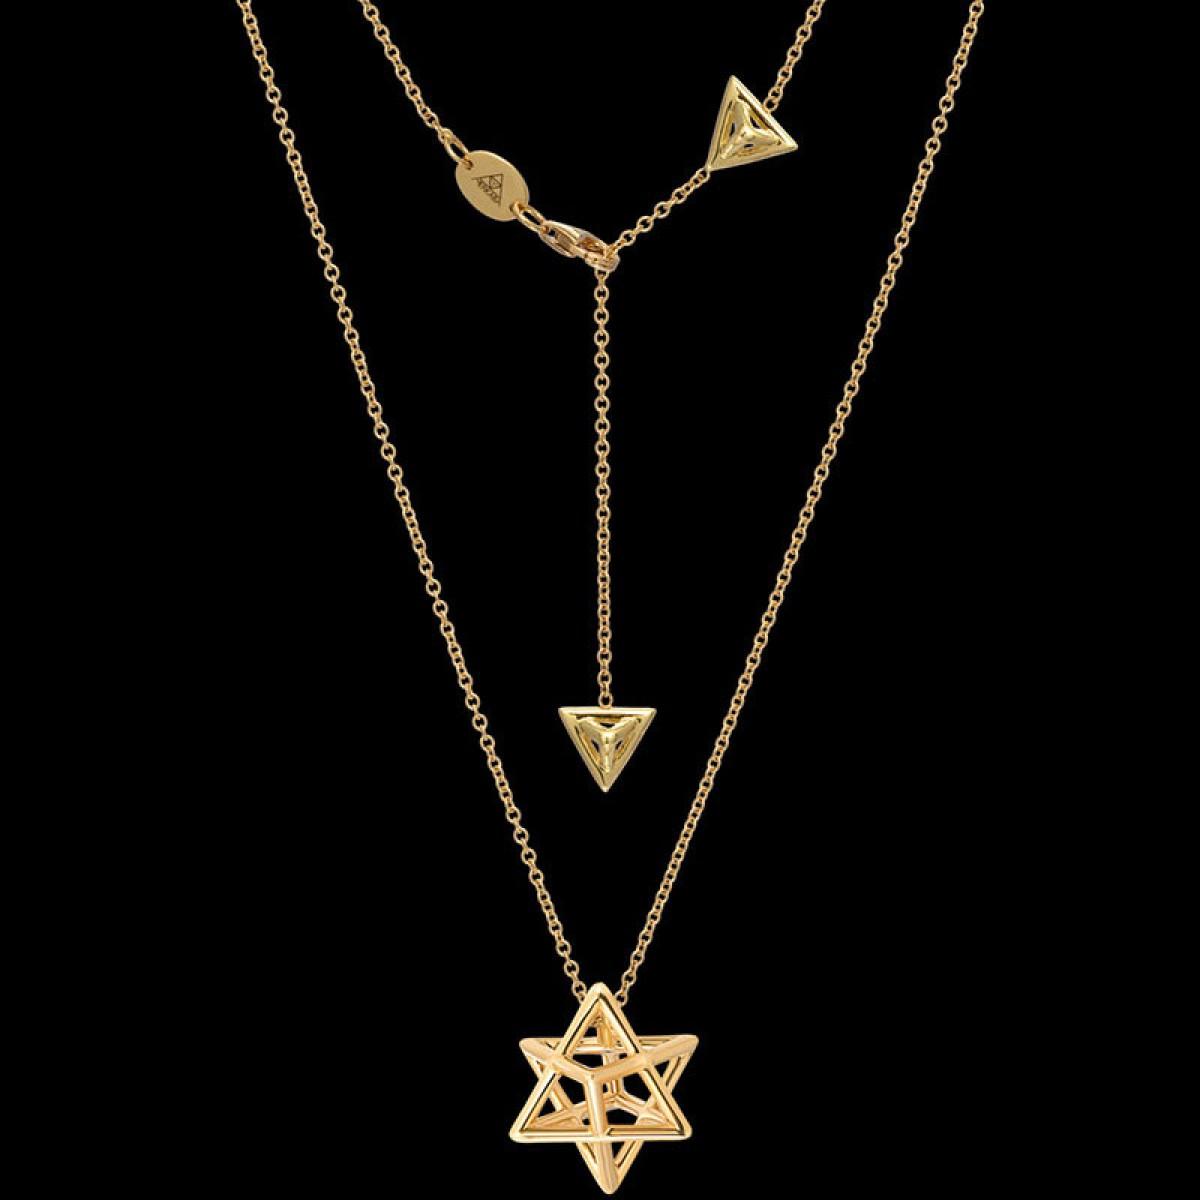 merkaba gold pendant necklace merkaba jewelry